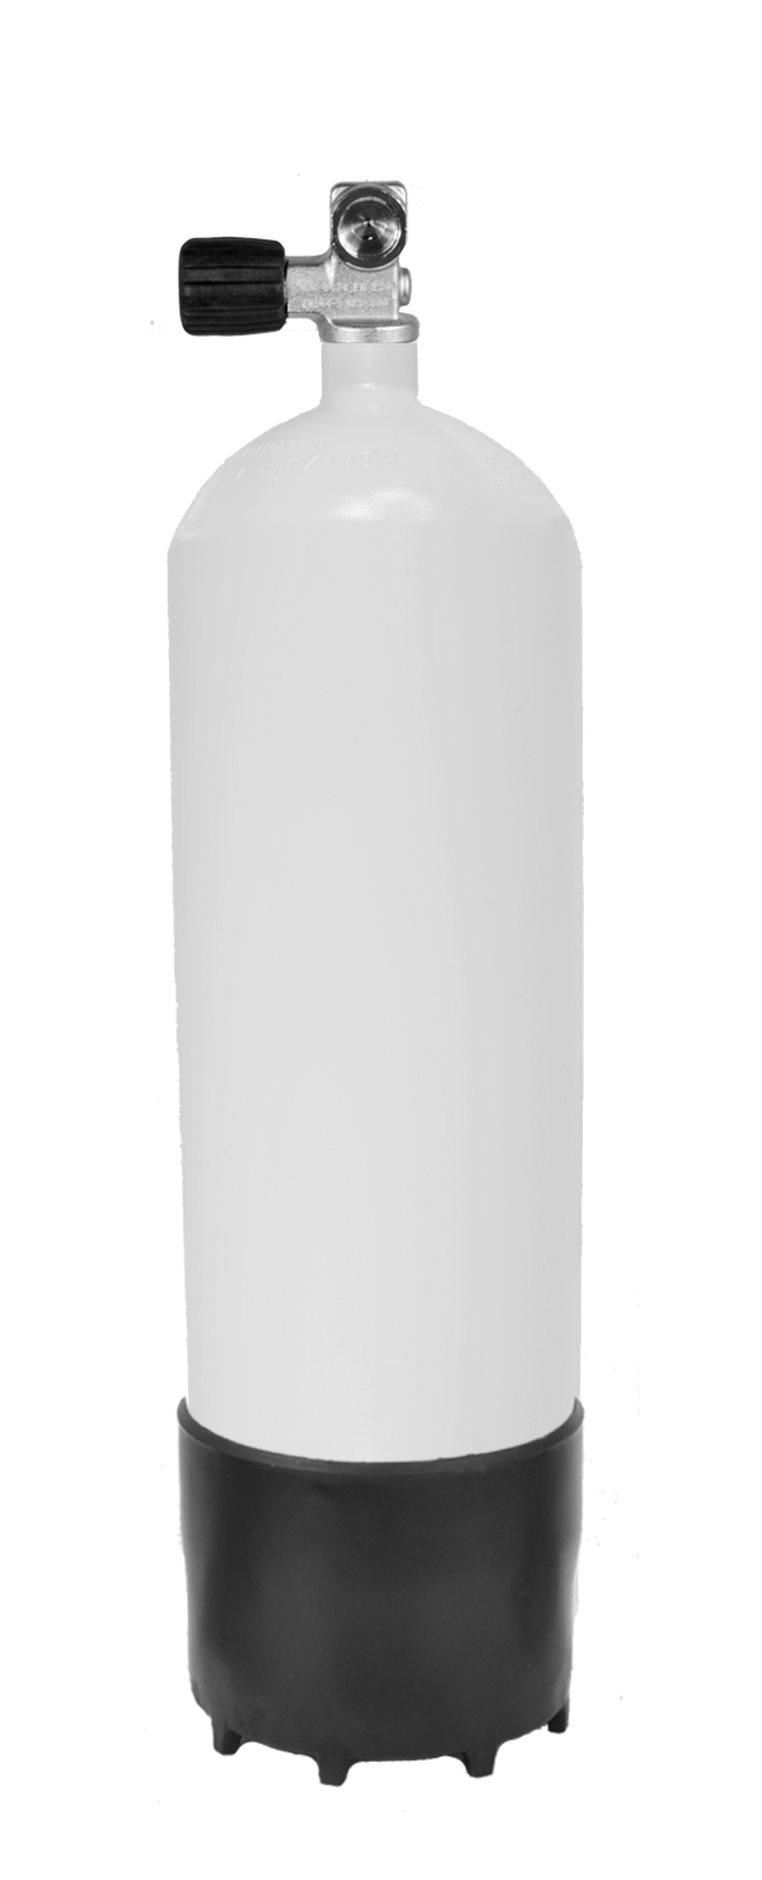 Водолазна бутилка 5 л / 232 бара - Eurocylinder